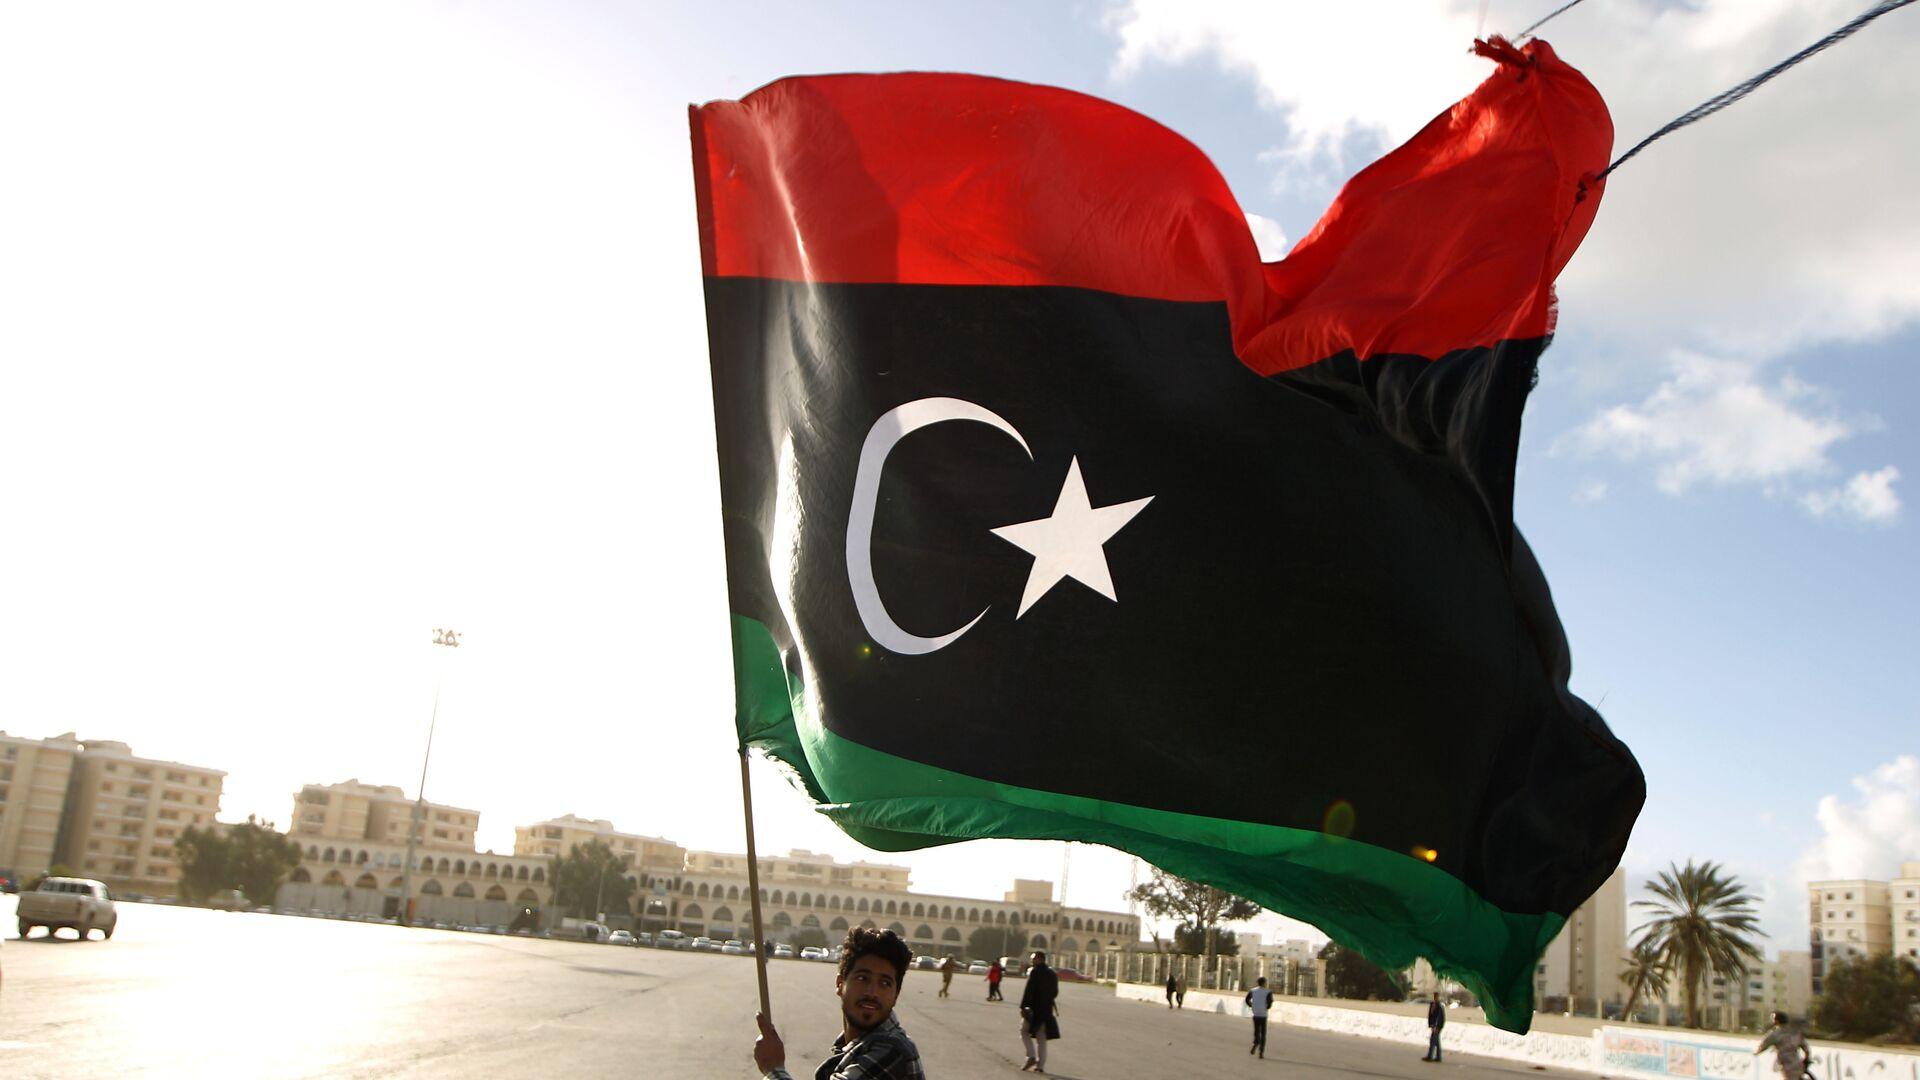 Flaga Libii - Sputnik Polska, 1920, 21.09.2021